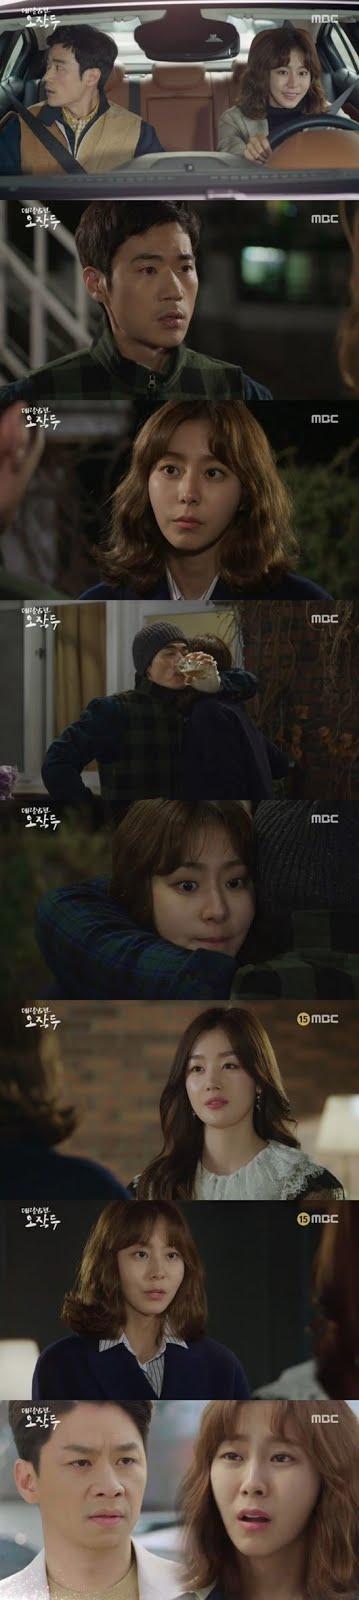 [Spoilers] My Husband Oh Jak Doo E05-06 + Rating